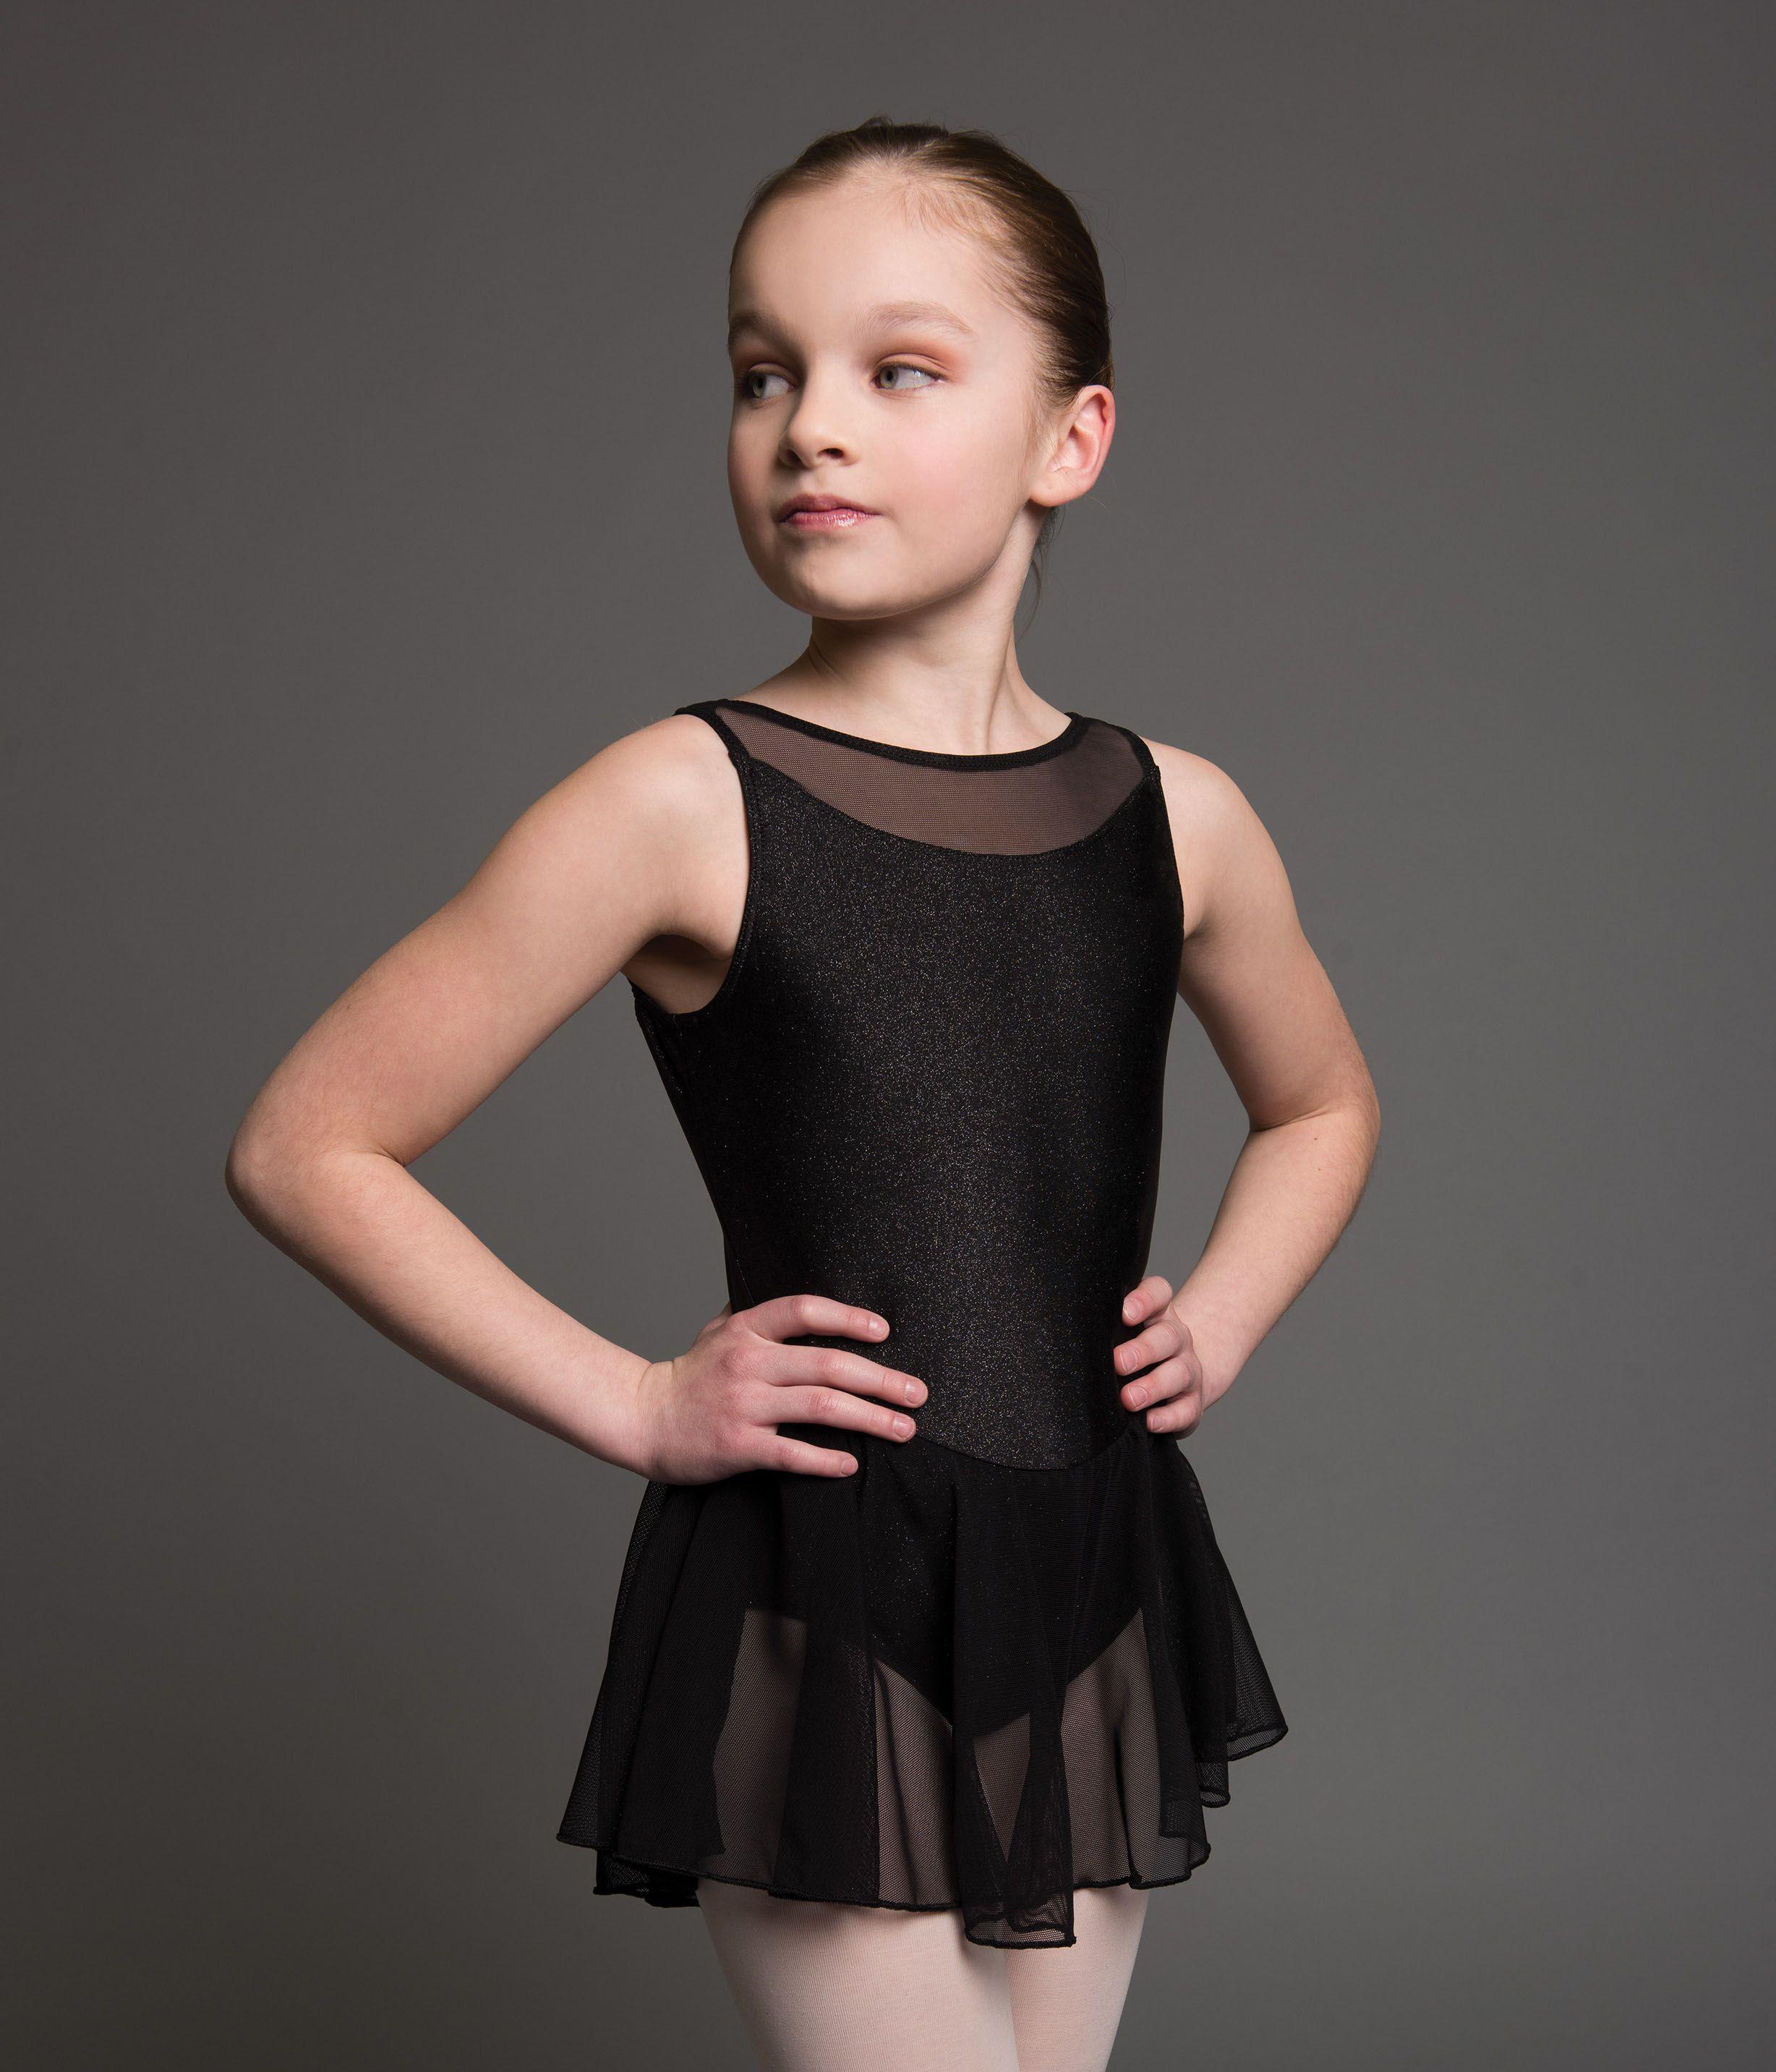 a2ba6df3b Kids Hadley Glitter Velour with Mesh Ballet Dance Leotard with ...